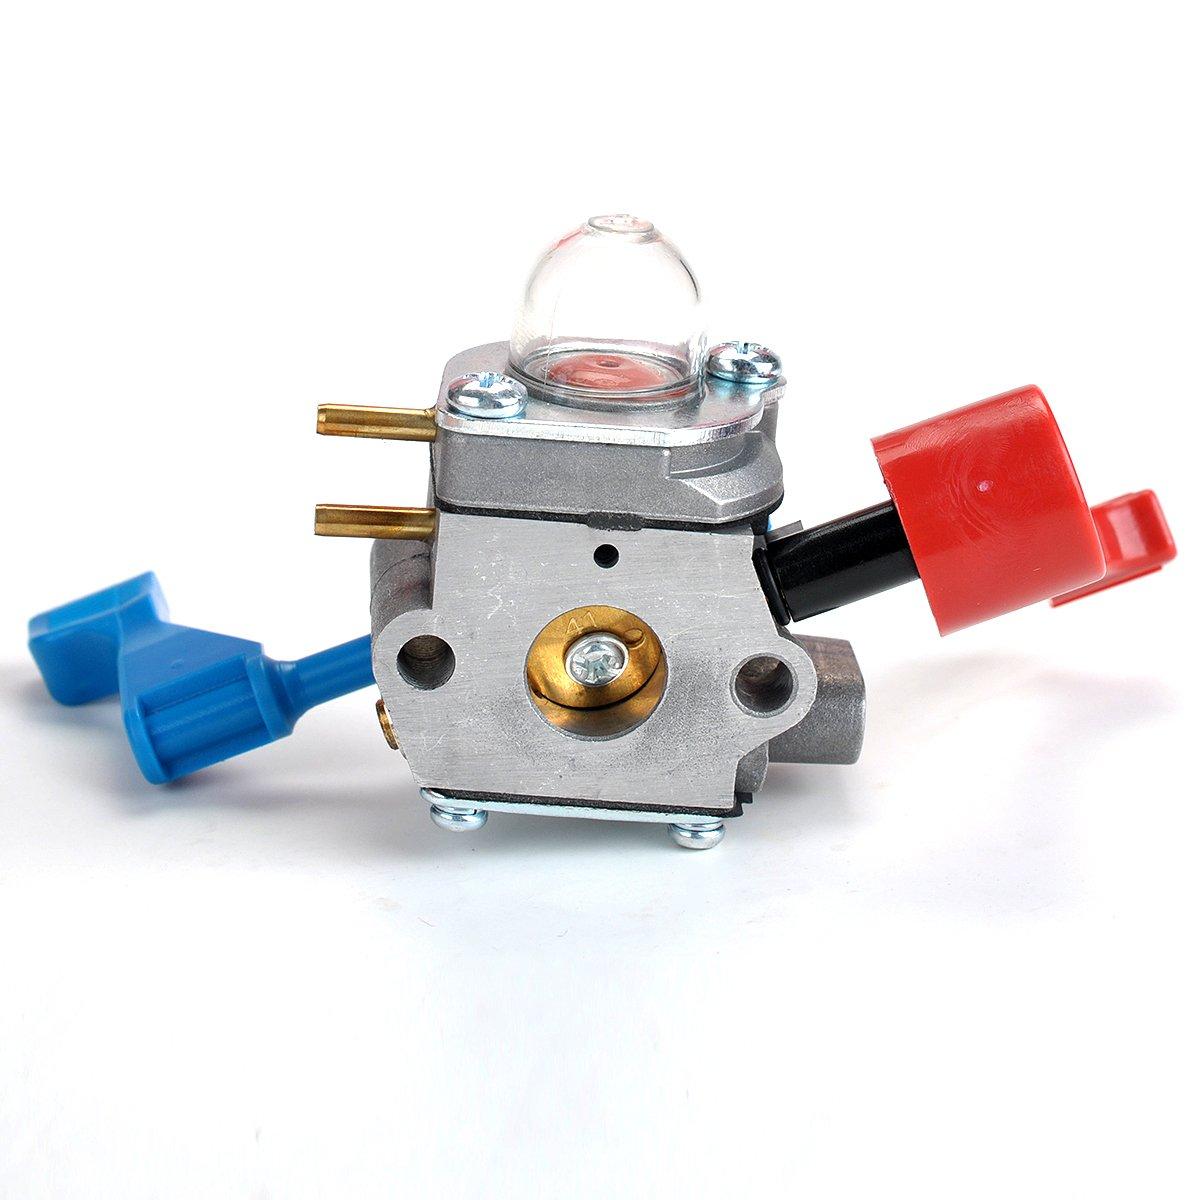 Butom Carburetor with Air Filter Gasket Fuel Line Filter for Zama C1U-W12B C1U-W12A Poulan FL1500 FL1500LE Leaf Blower 530071629 by Butom (Image #2)